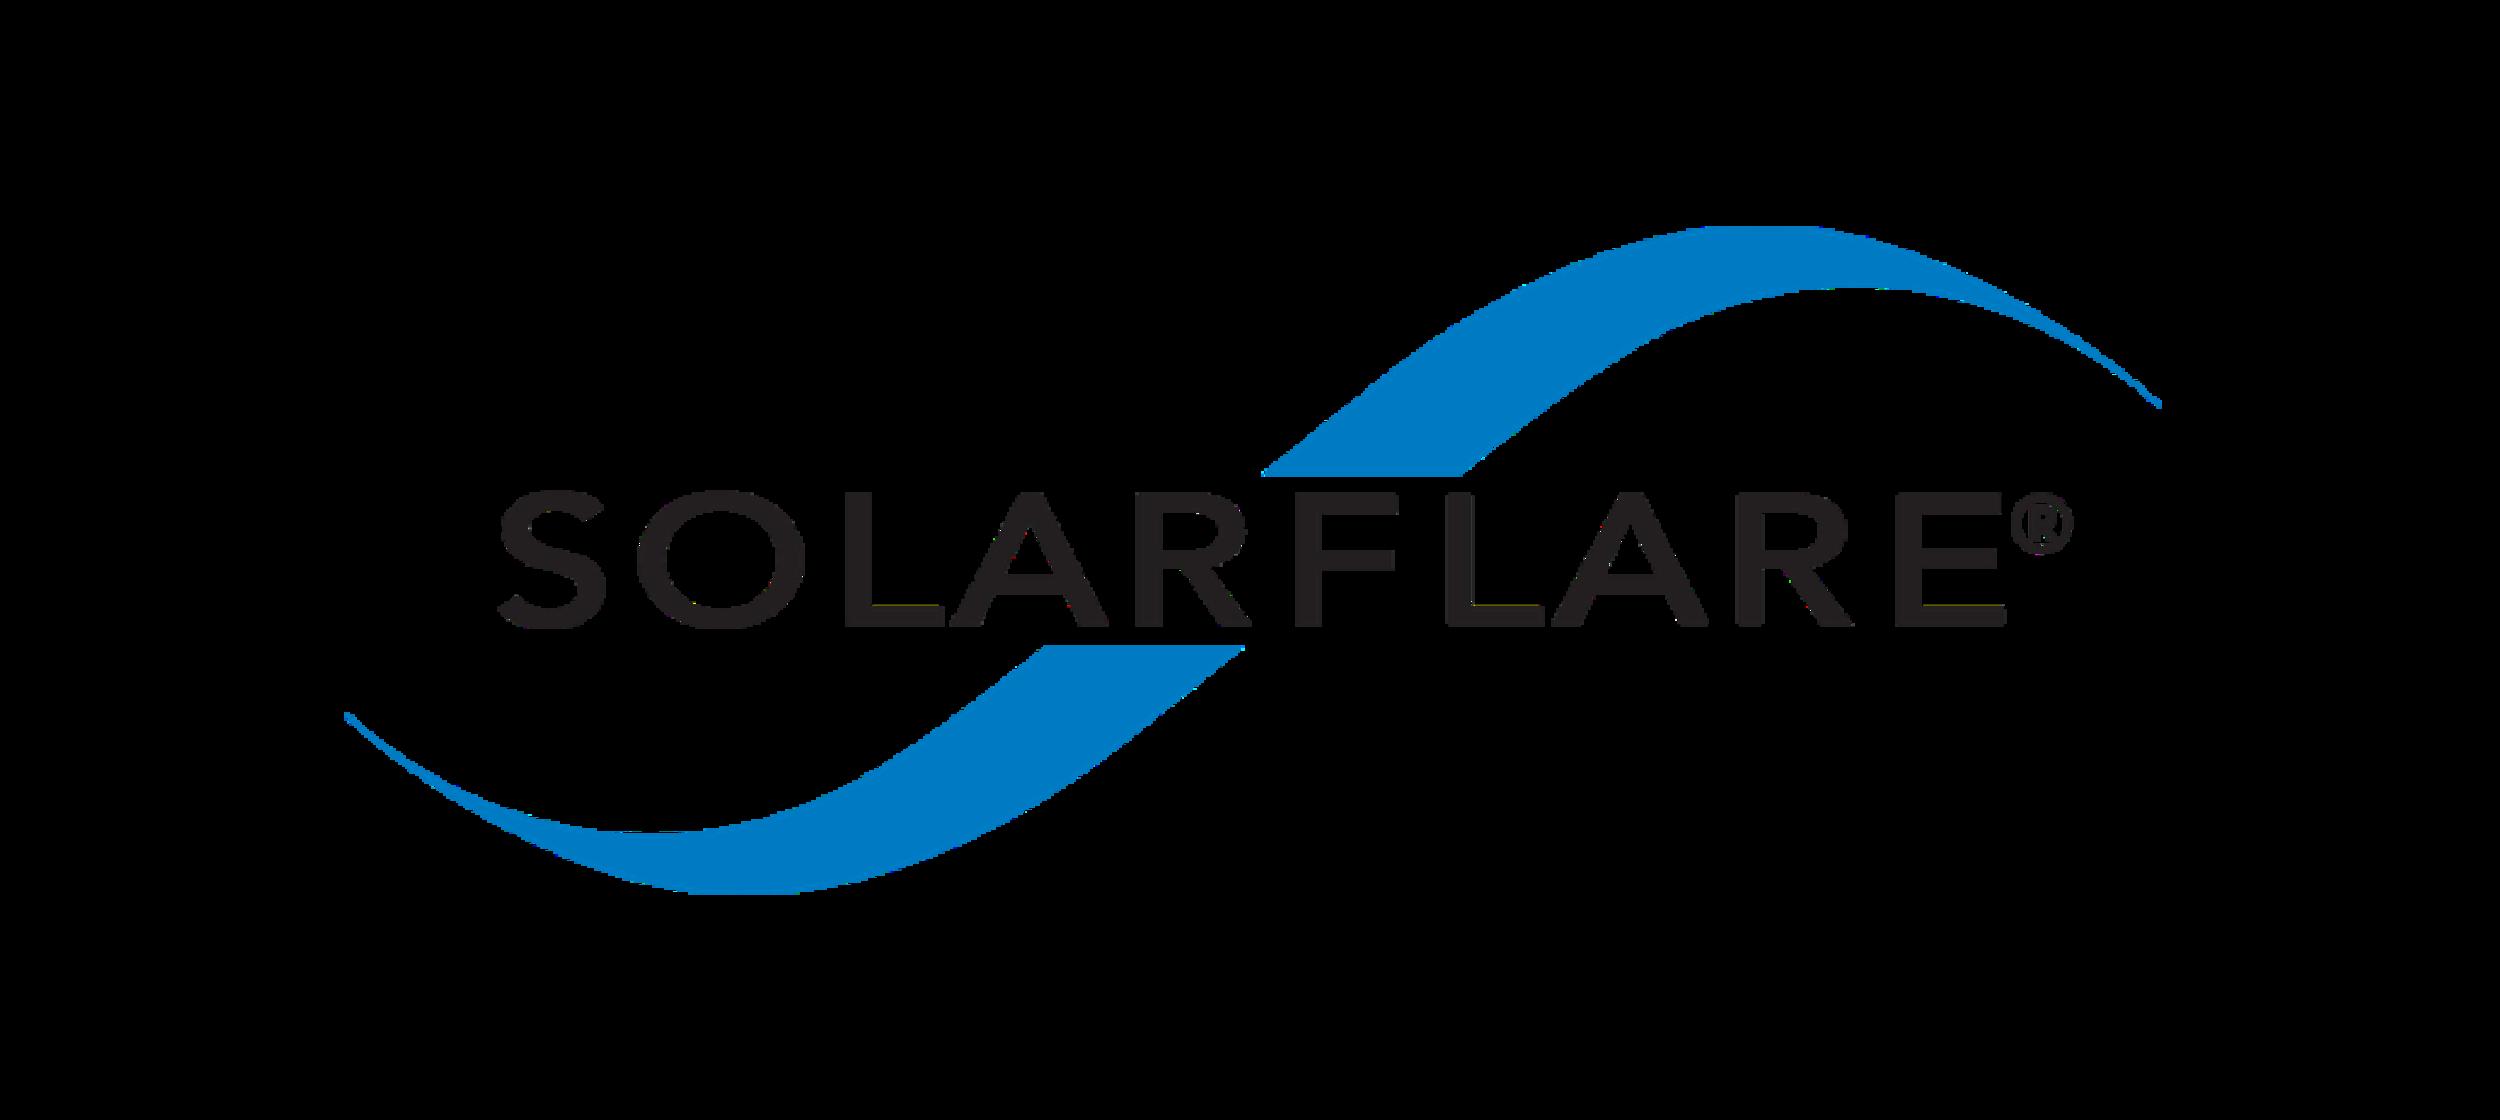 Partner_Logo_Solarflare-01.png